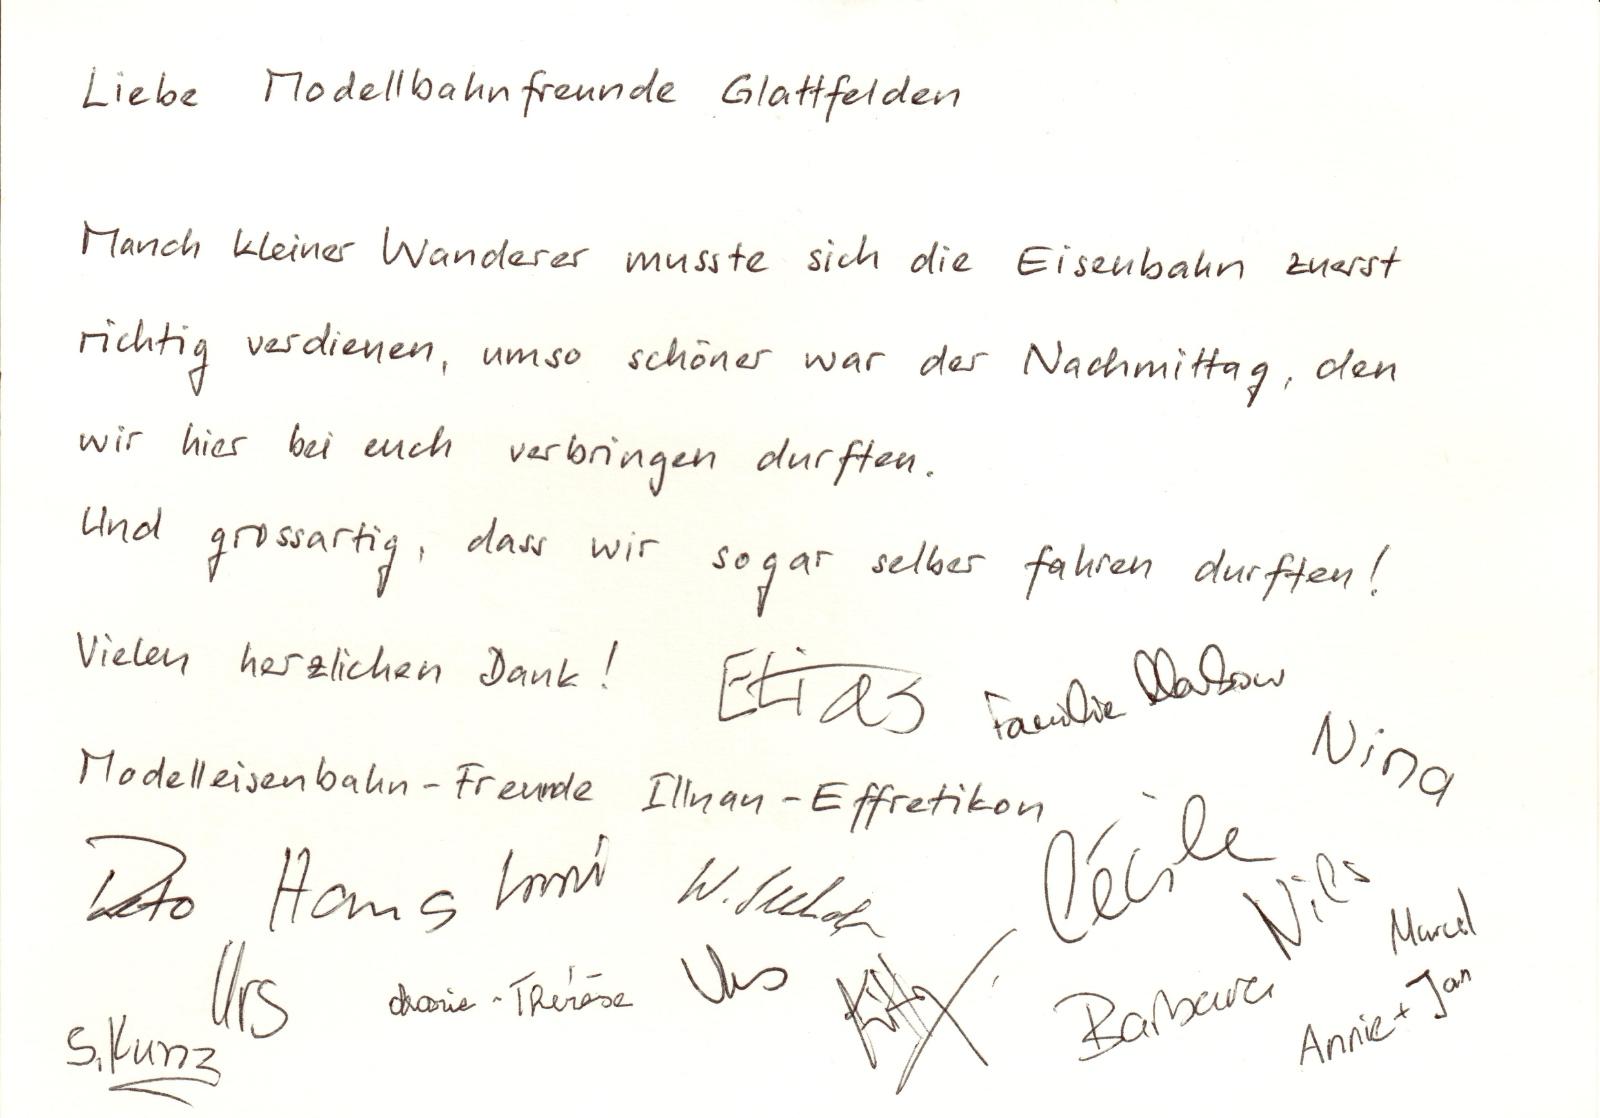 Dankkarte der Modelleisenbahn-Freunde Illnau-Effretikon